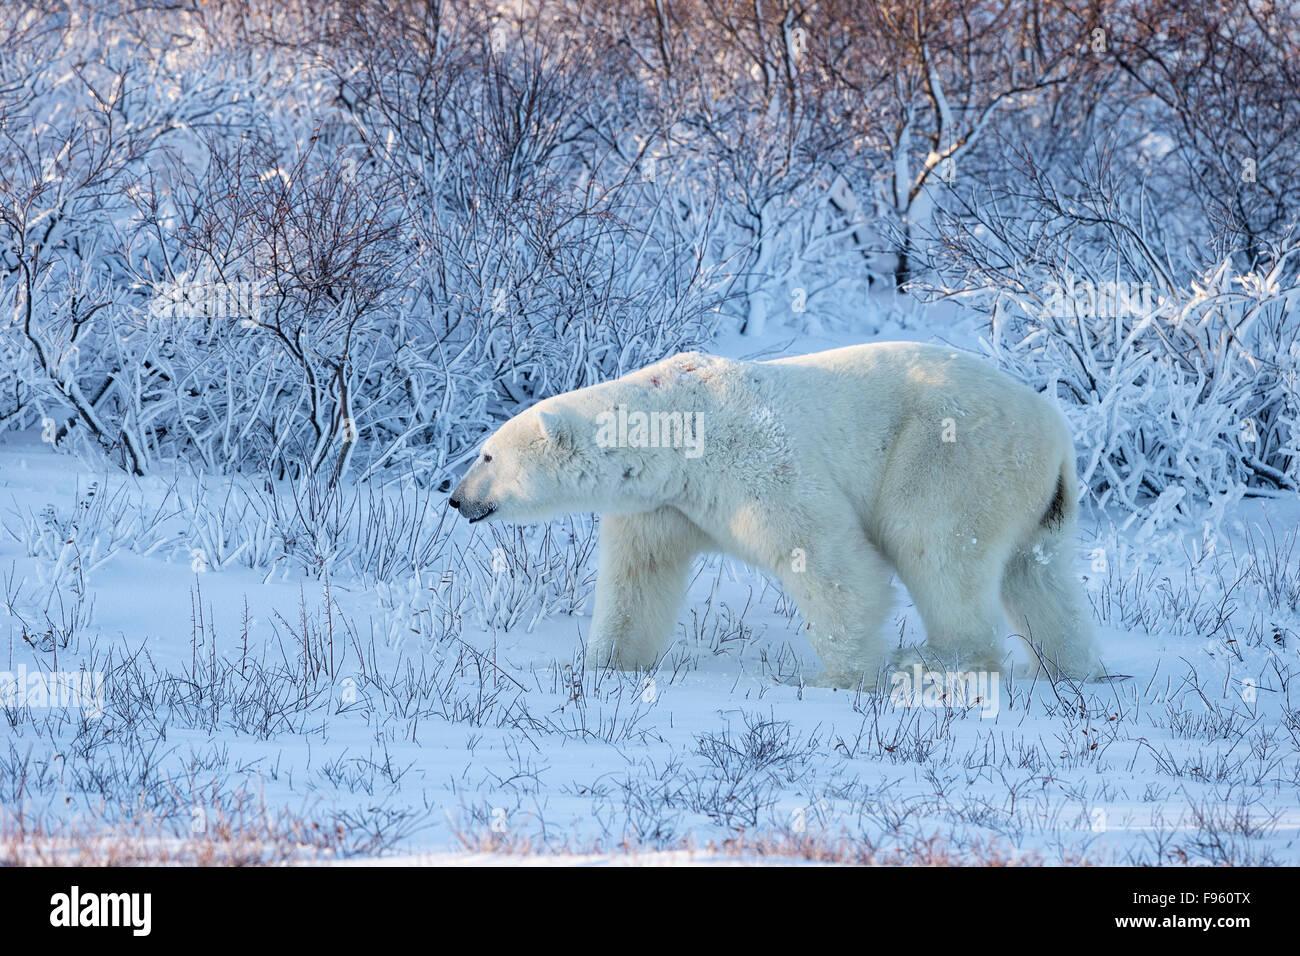 Orso polare (Ursus maritimus), maschio a passeggio tra salici (Salix sp.), Cape Churchill, Wapusk National Park, Immagini Stock